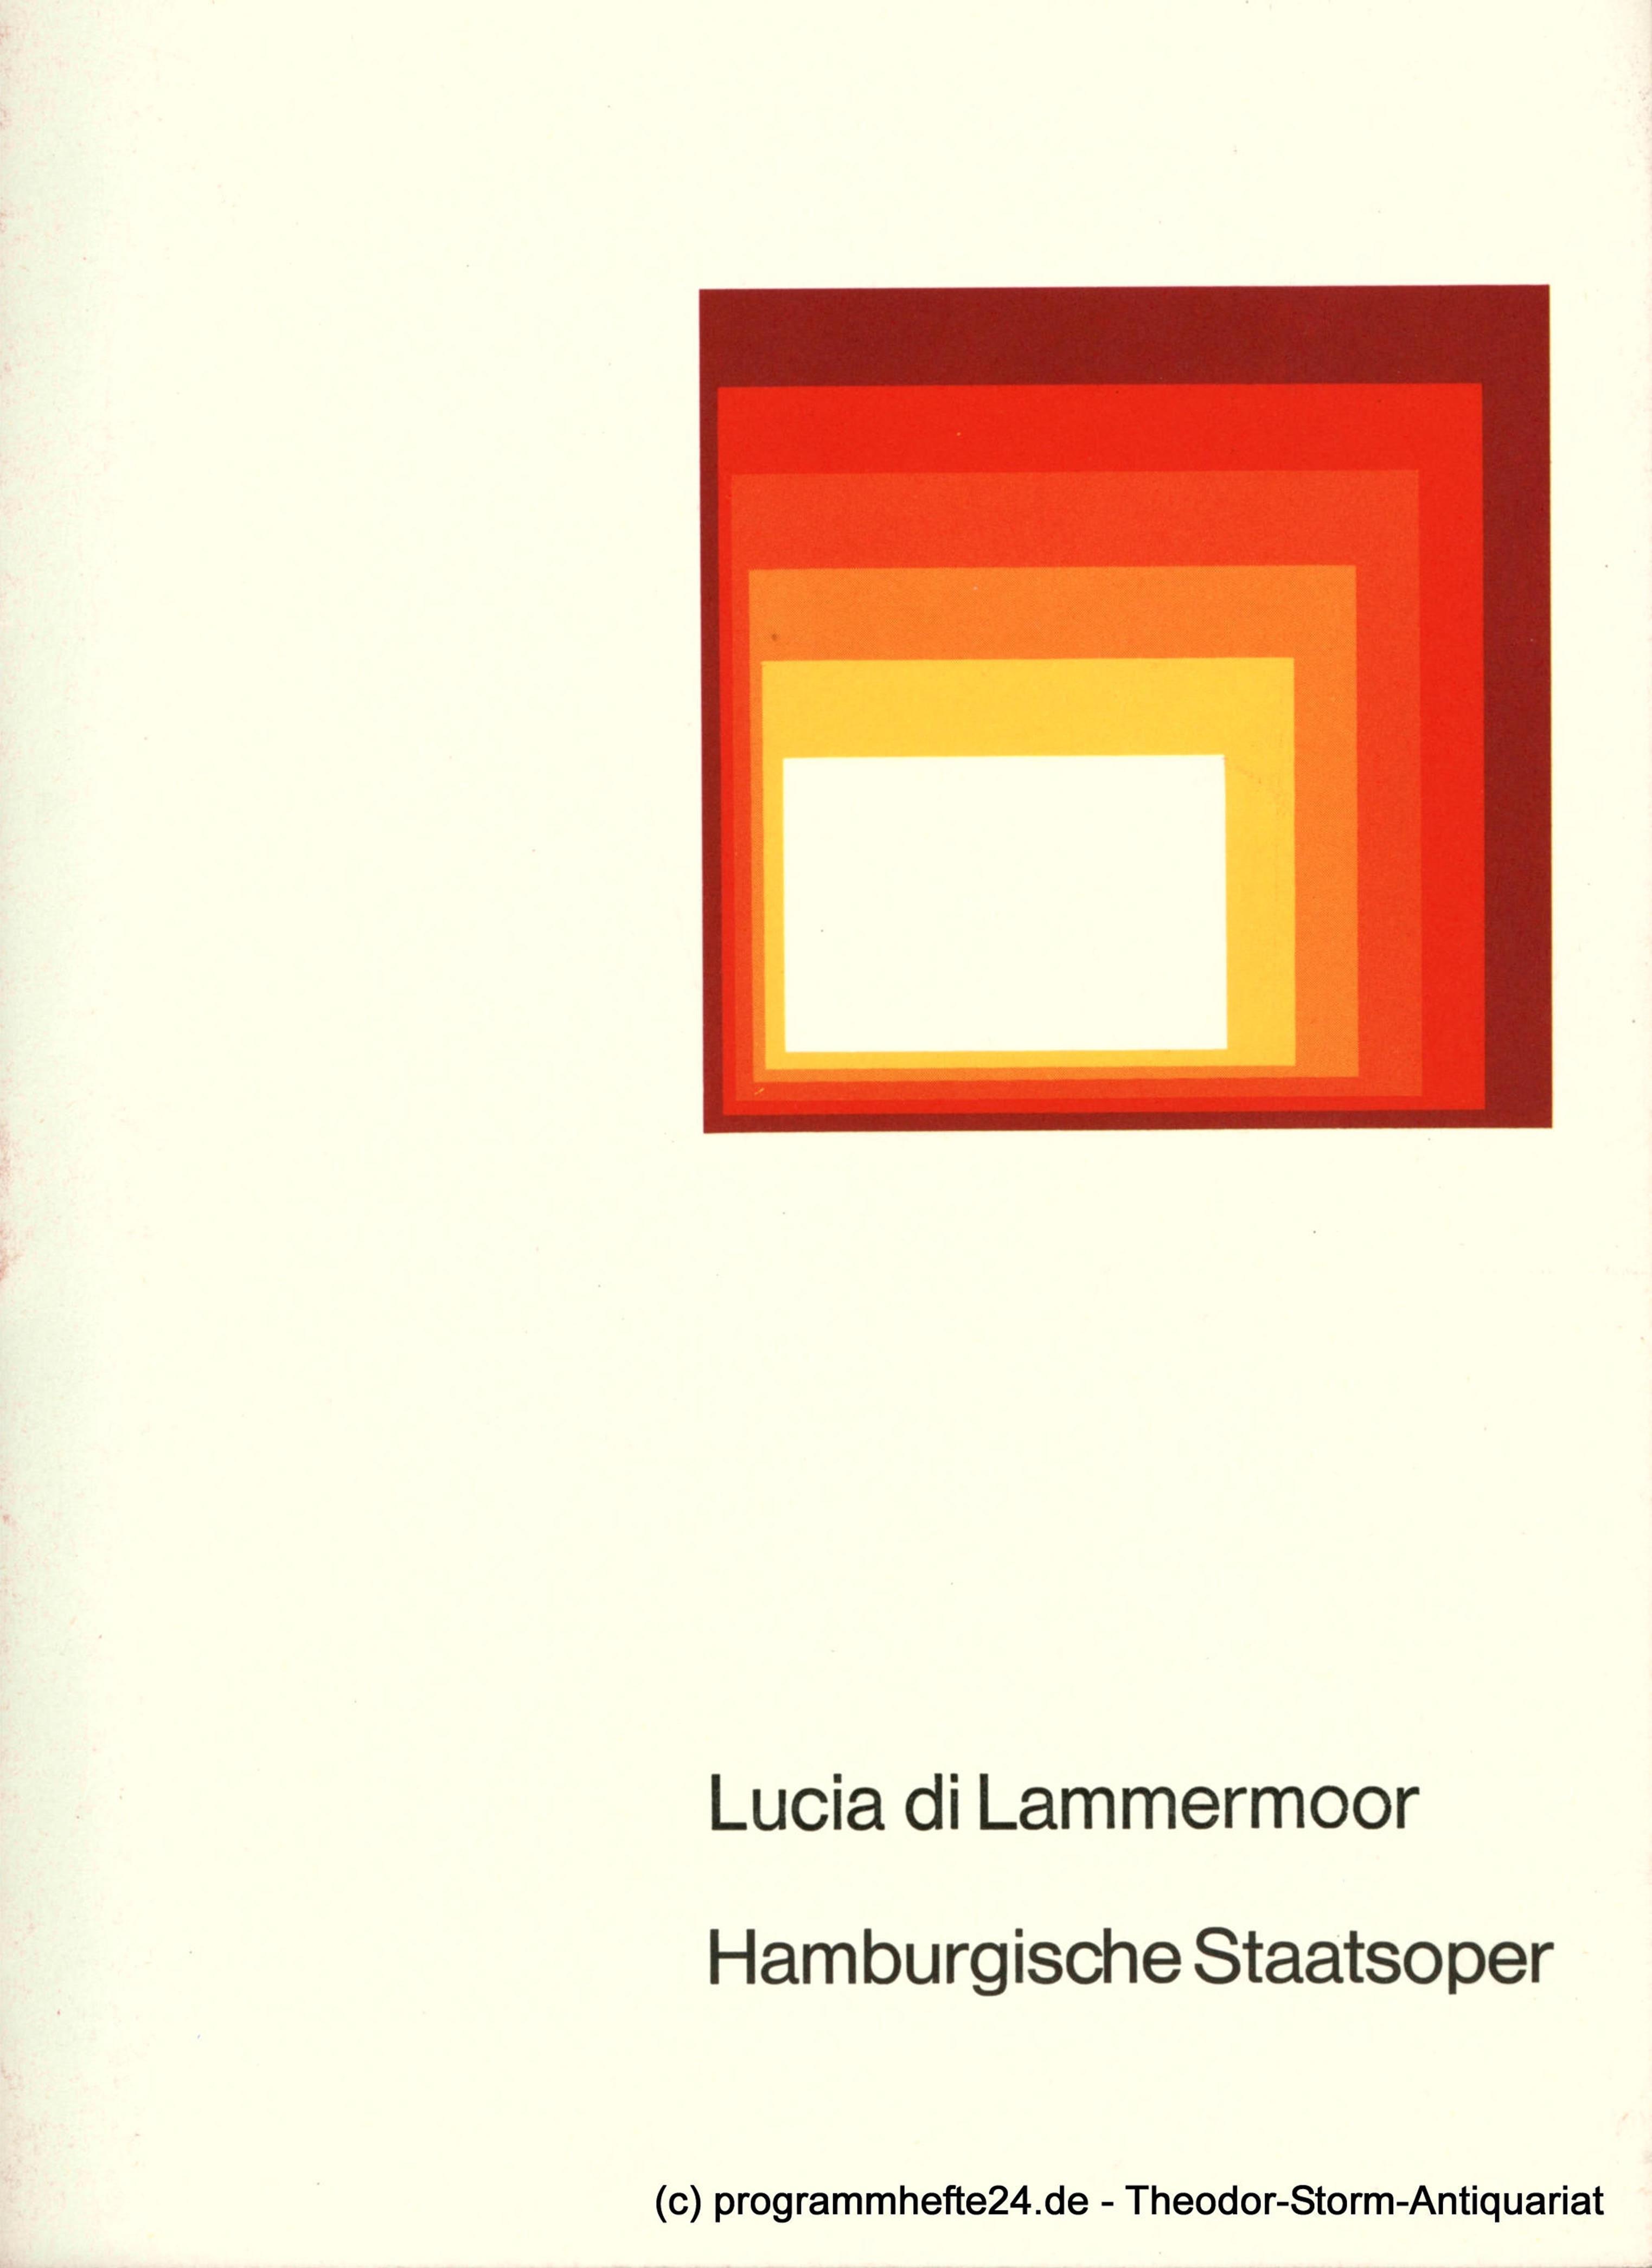 Programmheft Lucia di Lammermoor, Oper Hamburg 1975